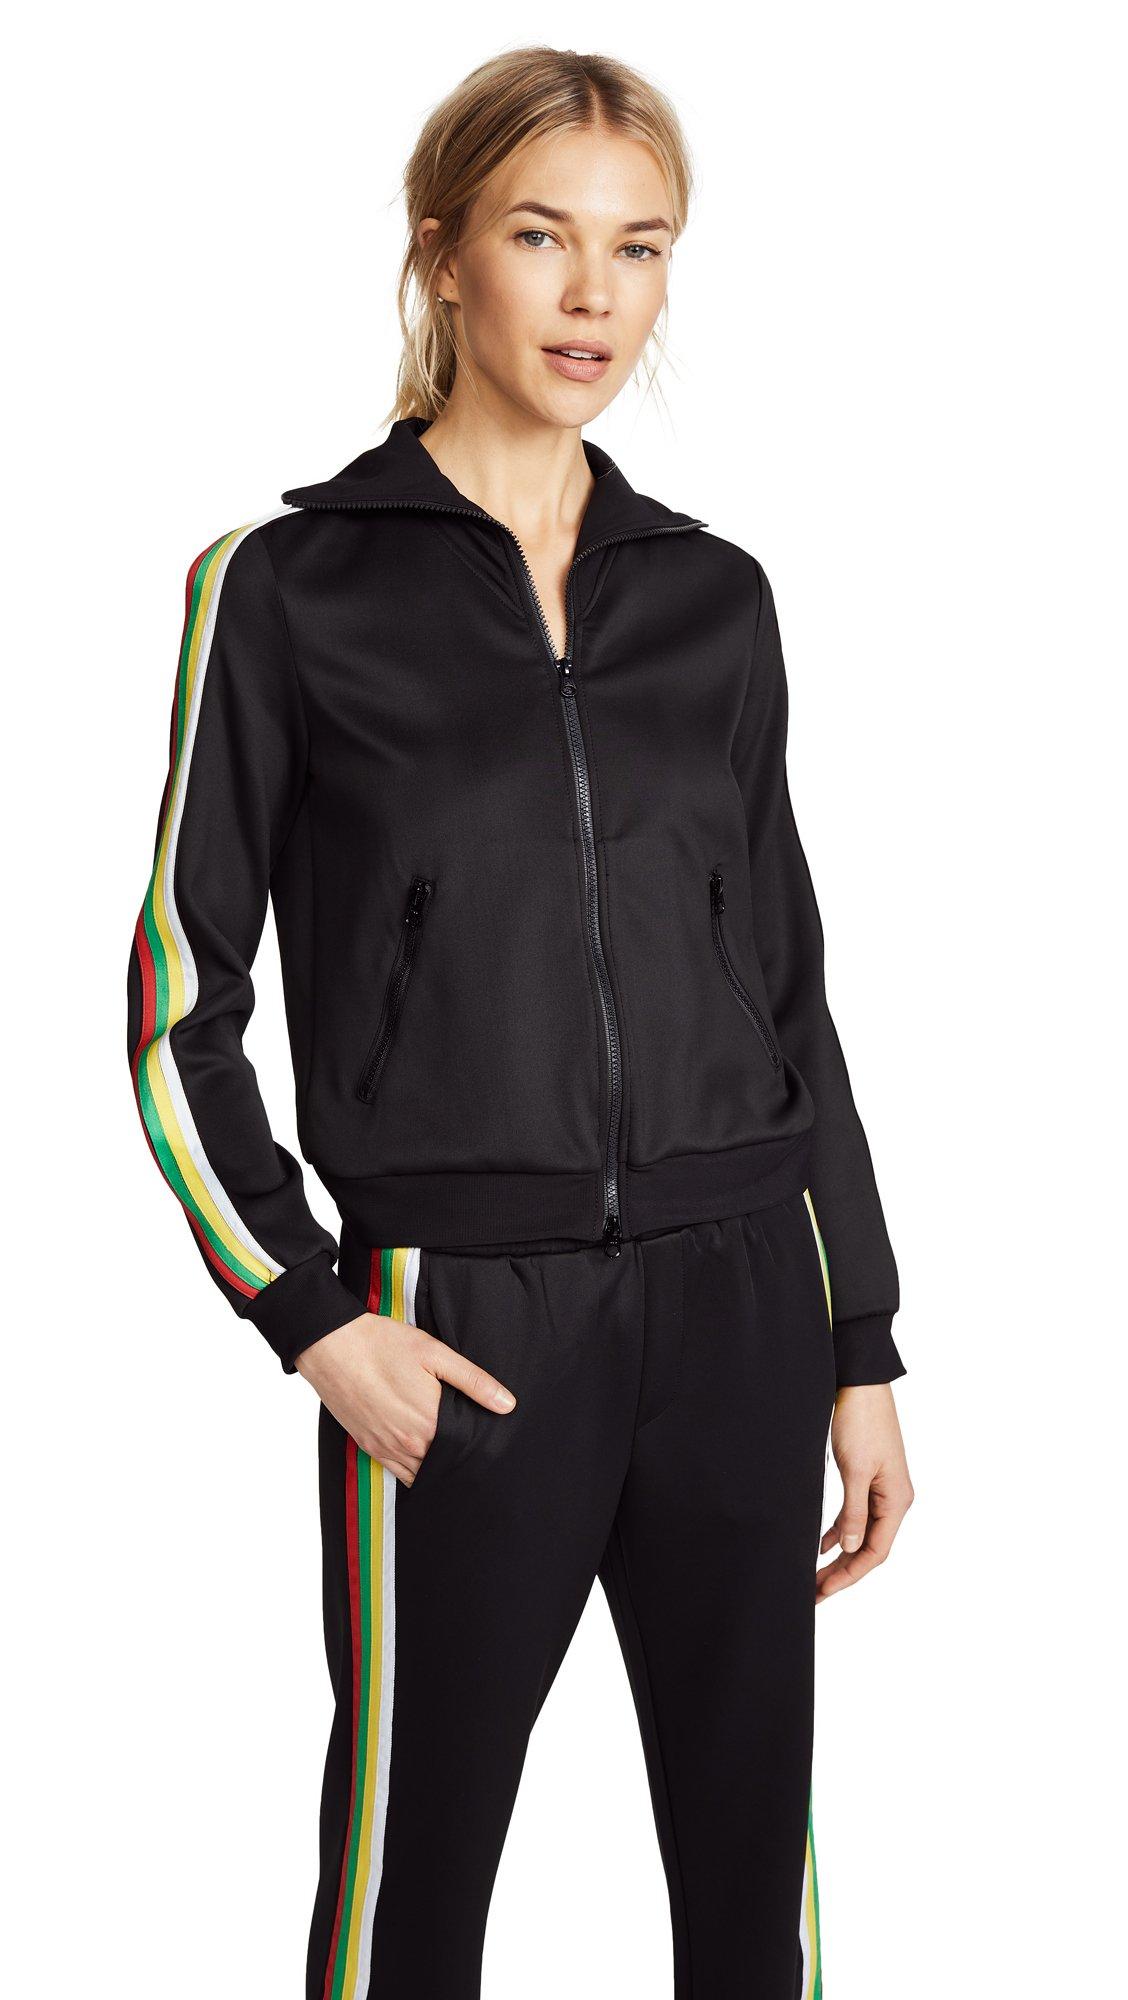 Pam & Gela Women's Track Jacket with Rainbow Sportstripes, Black, Petite